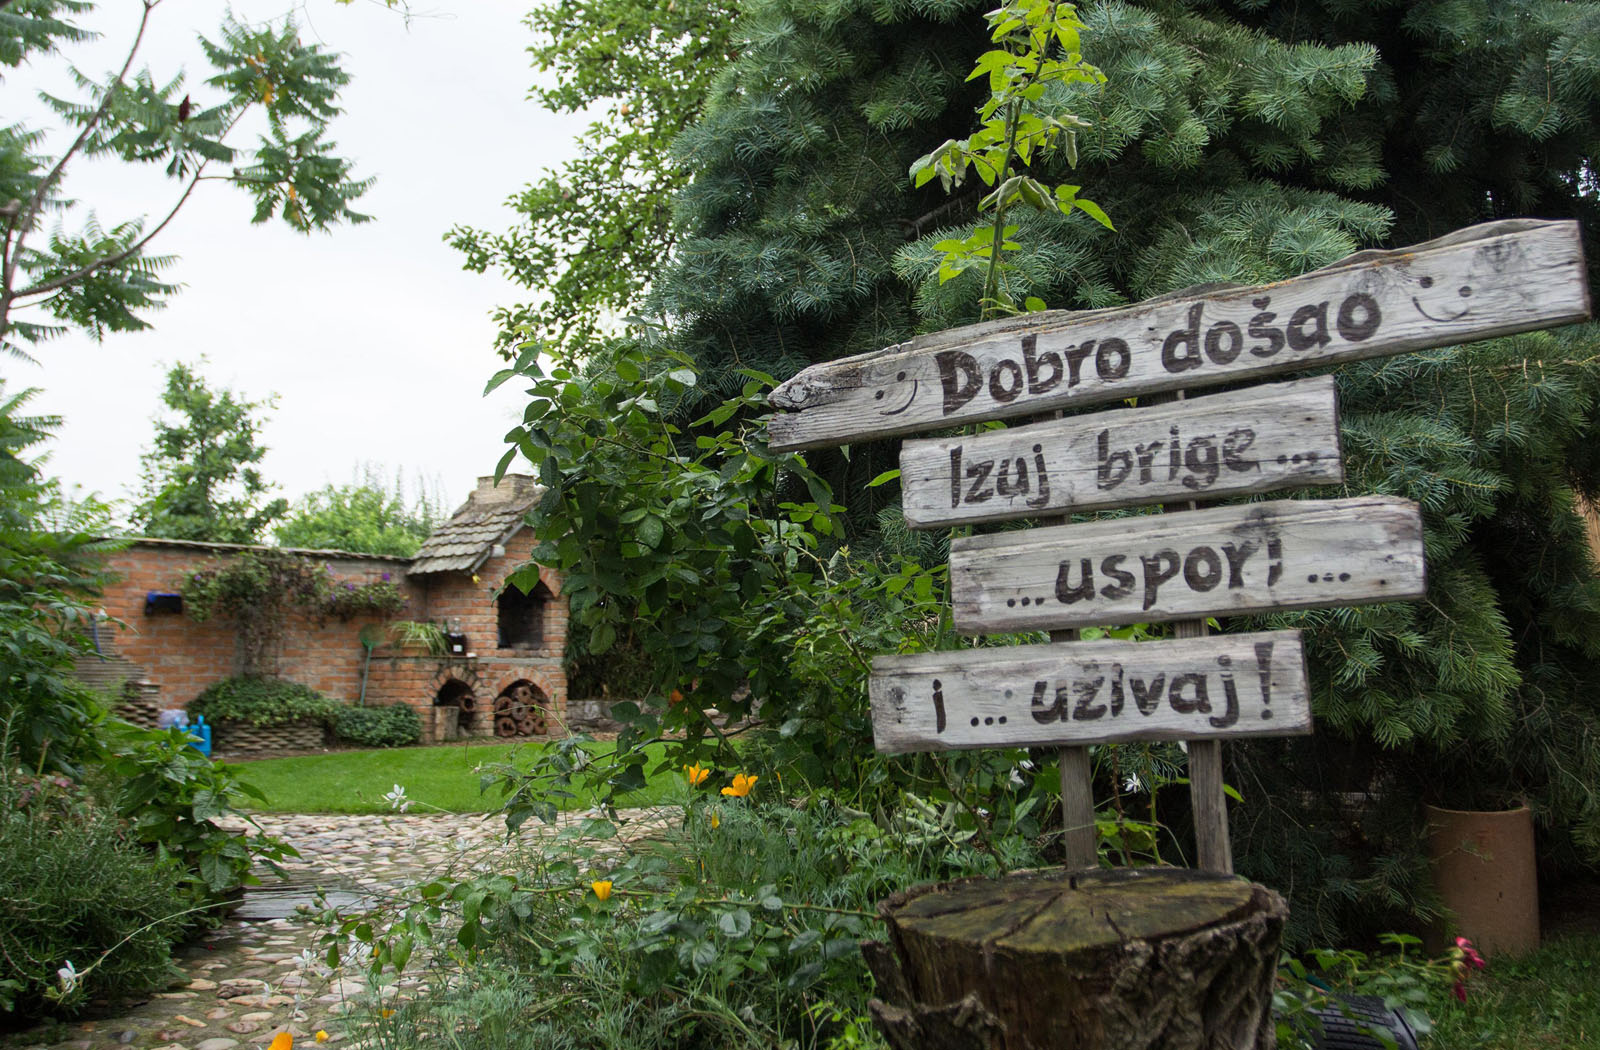 Cepin, 040718 Vrtna bajka, vrt Zdenke i Zeljka Matagic u Cepinu. Na fotografiji: Vrtna bajka u Cepinu. Foto: Emica Elvedji / CROPIX